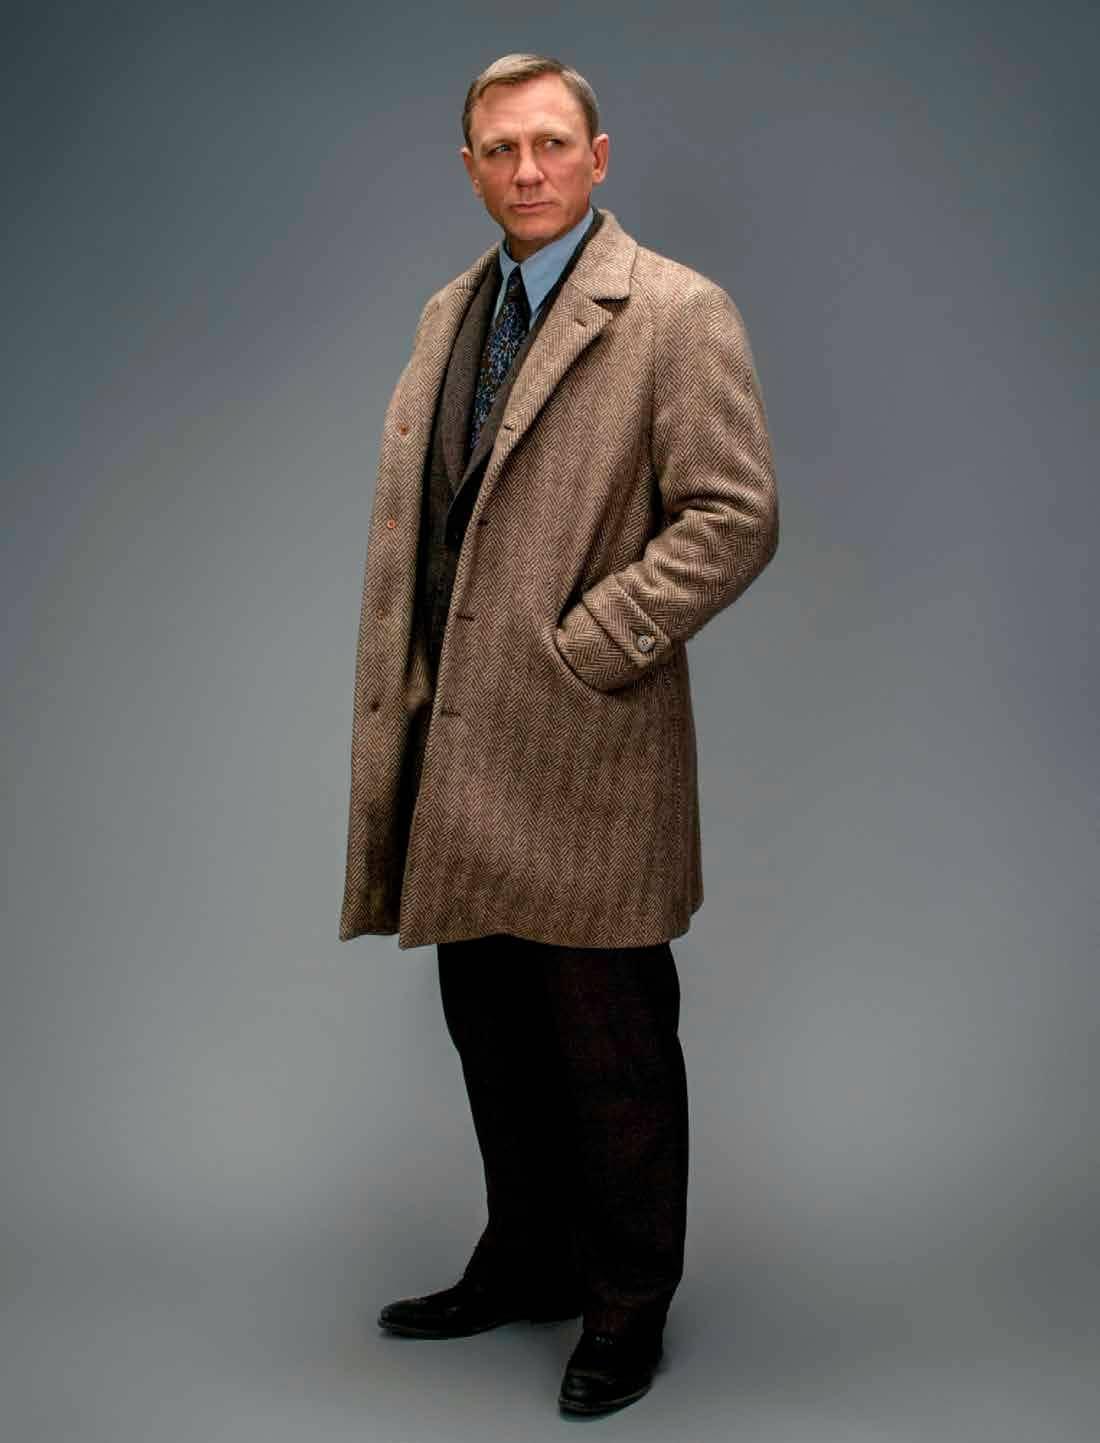 Daniel Craig - Actor / Chester, UK / 51 años